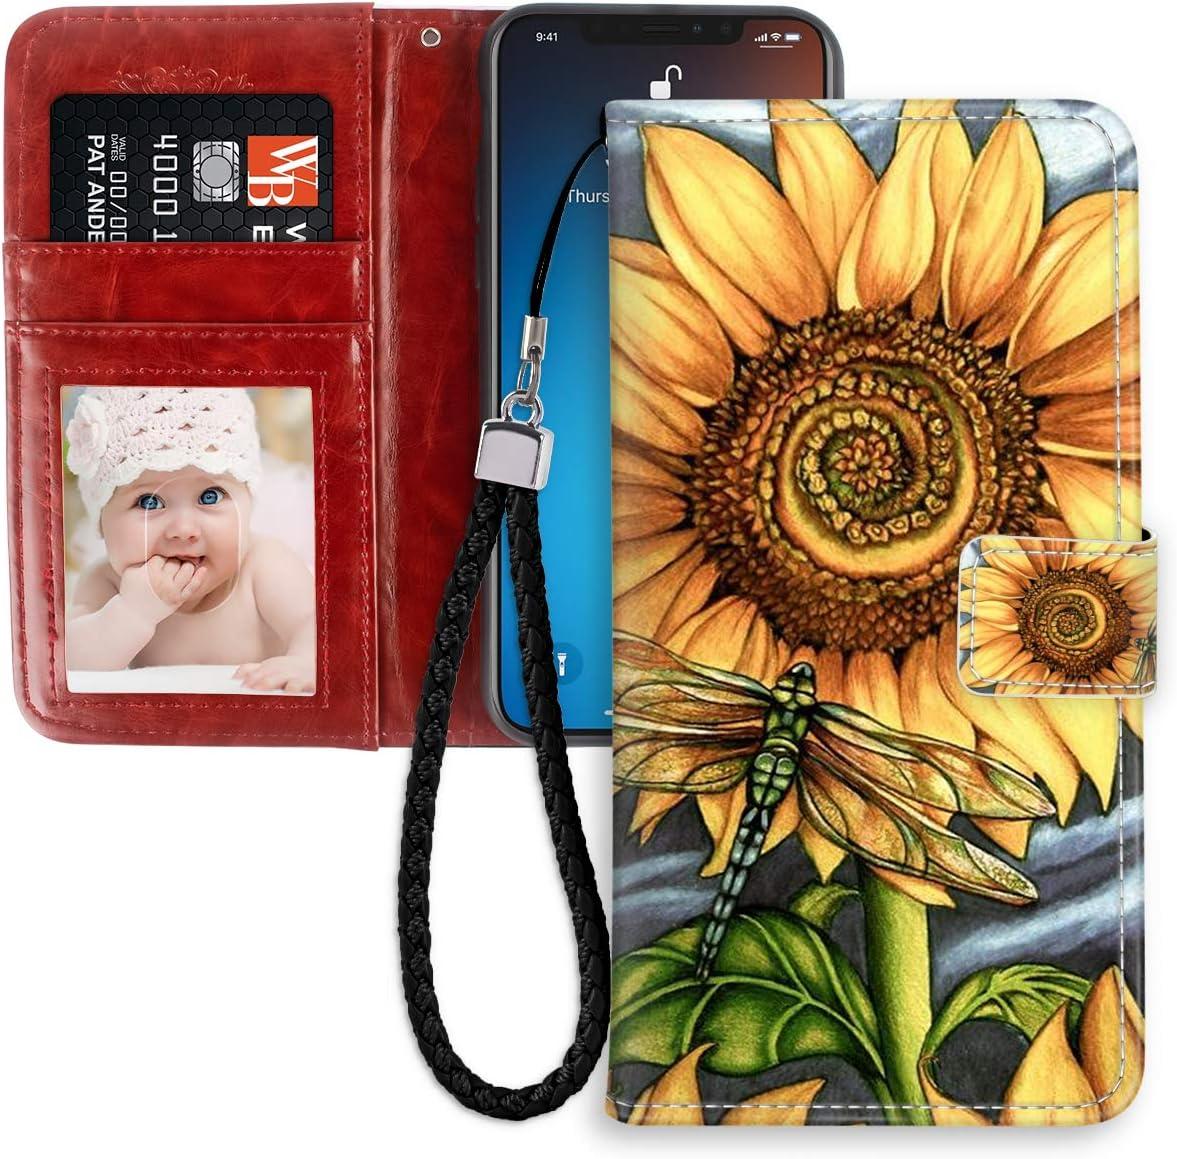 7 PLUS 5 7 Flowers RFID Phone Wallet Case iPhone X Se Galaxy Note